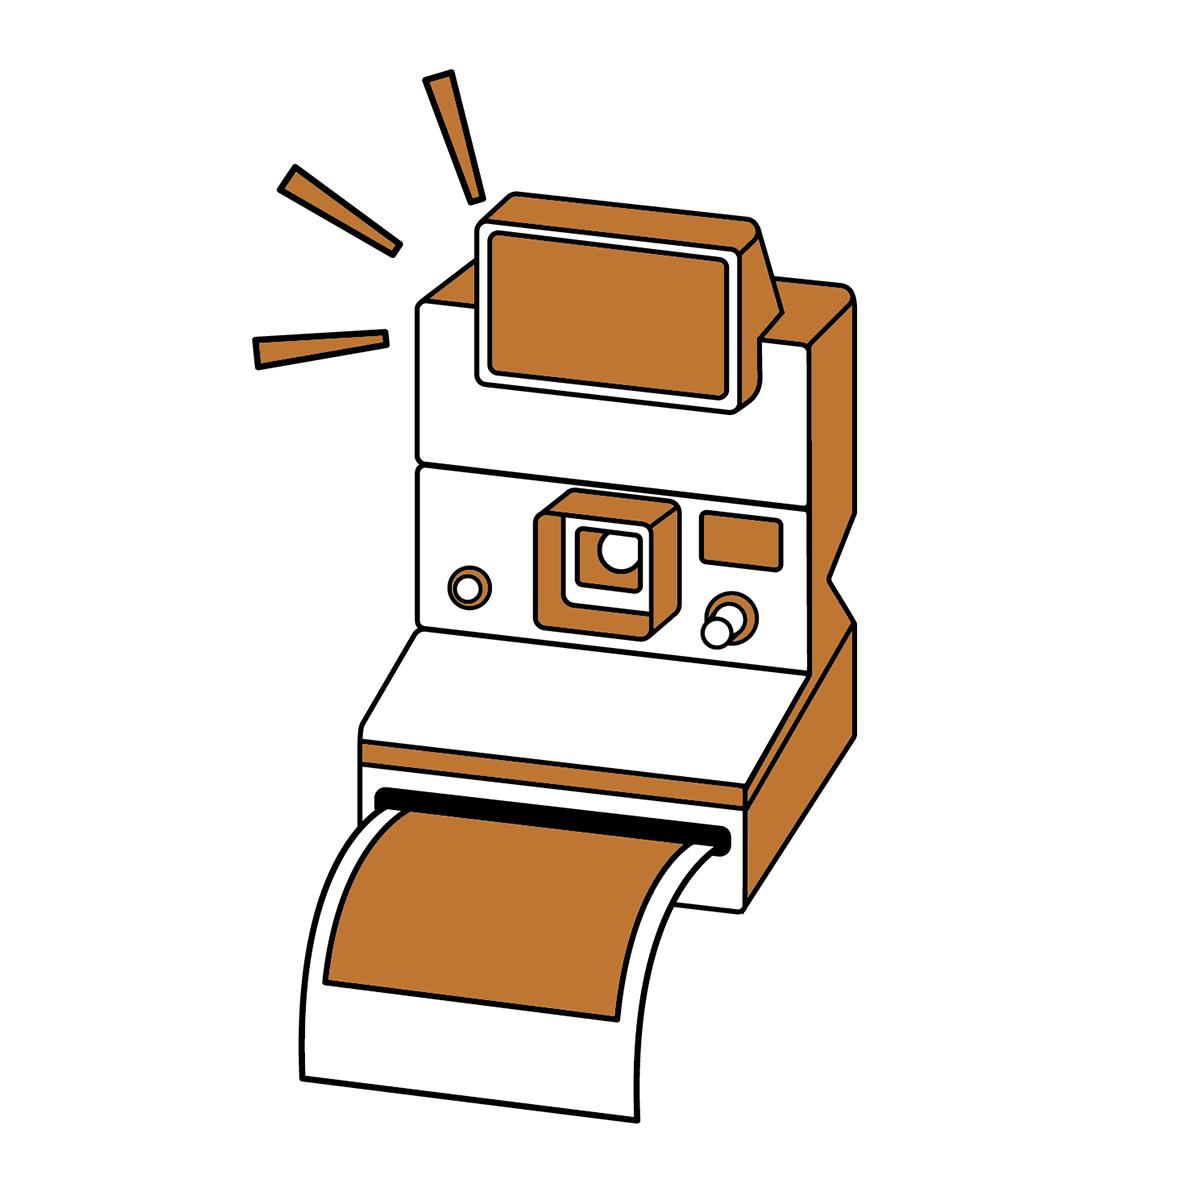 Plastbyggesett, icm-48290-cessna-o-2a-skymaster-scale-1-48, ICM48290